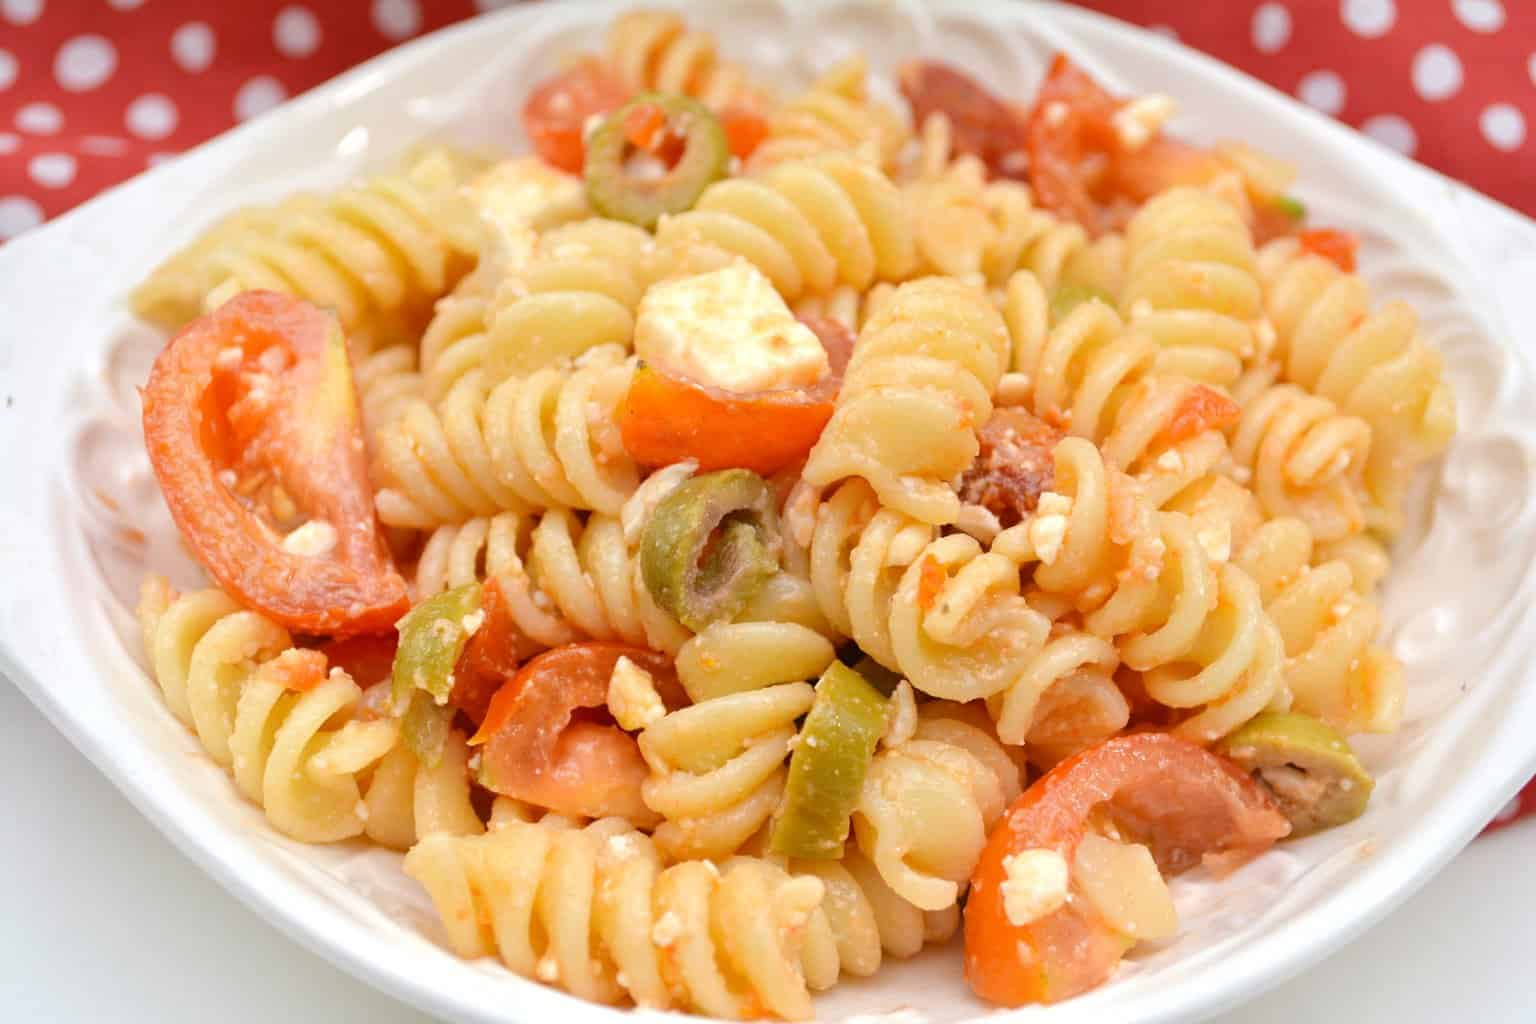 Tomato and Feta Pasta Salad